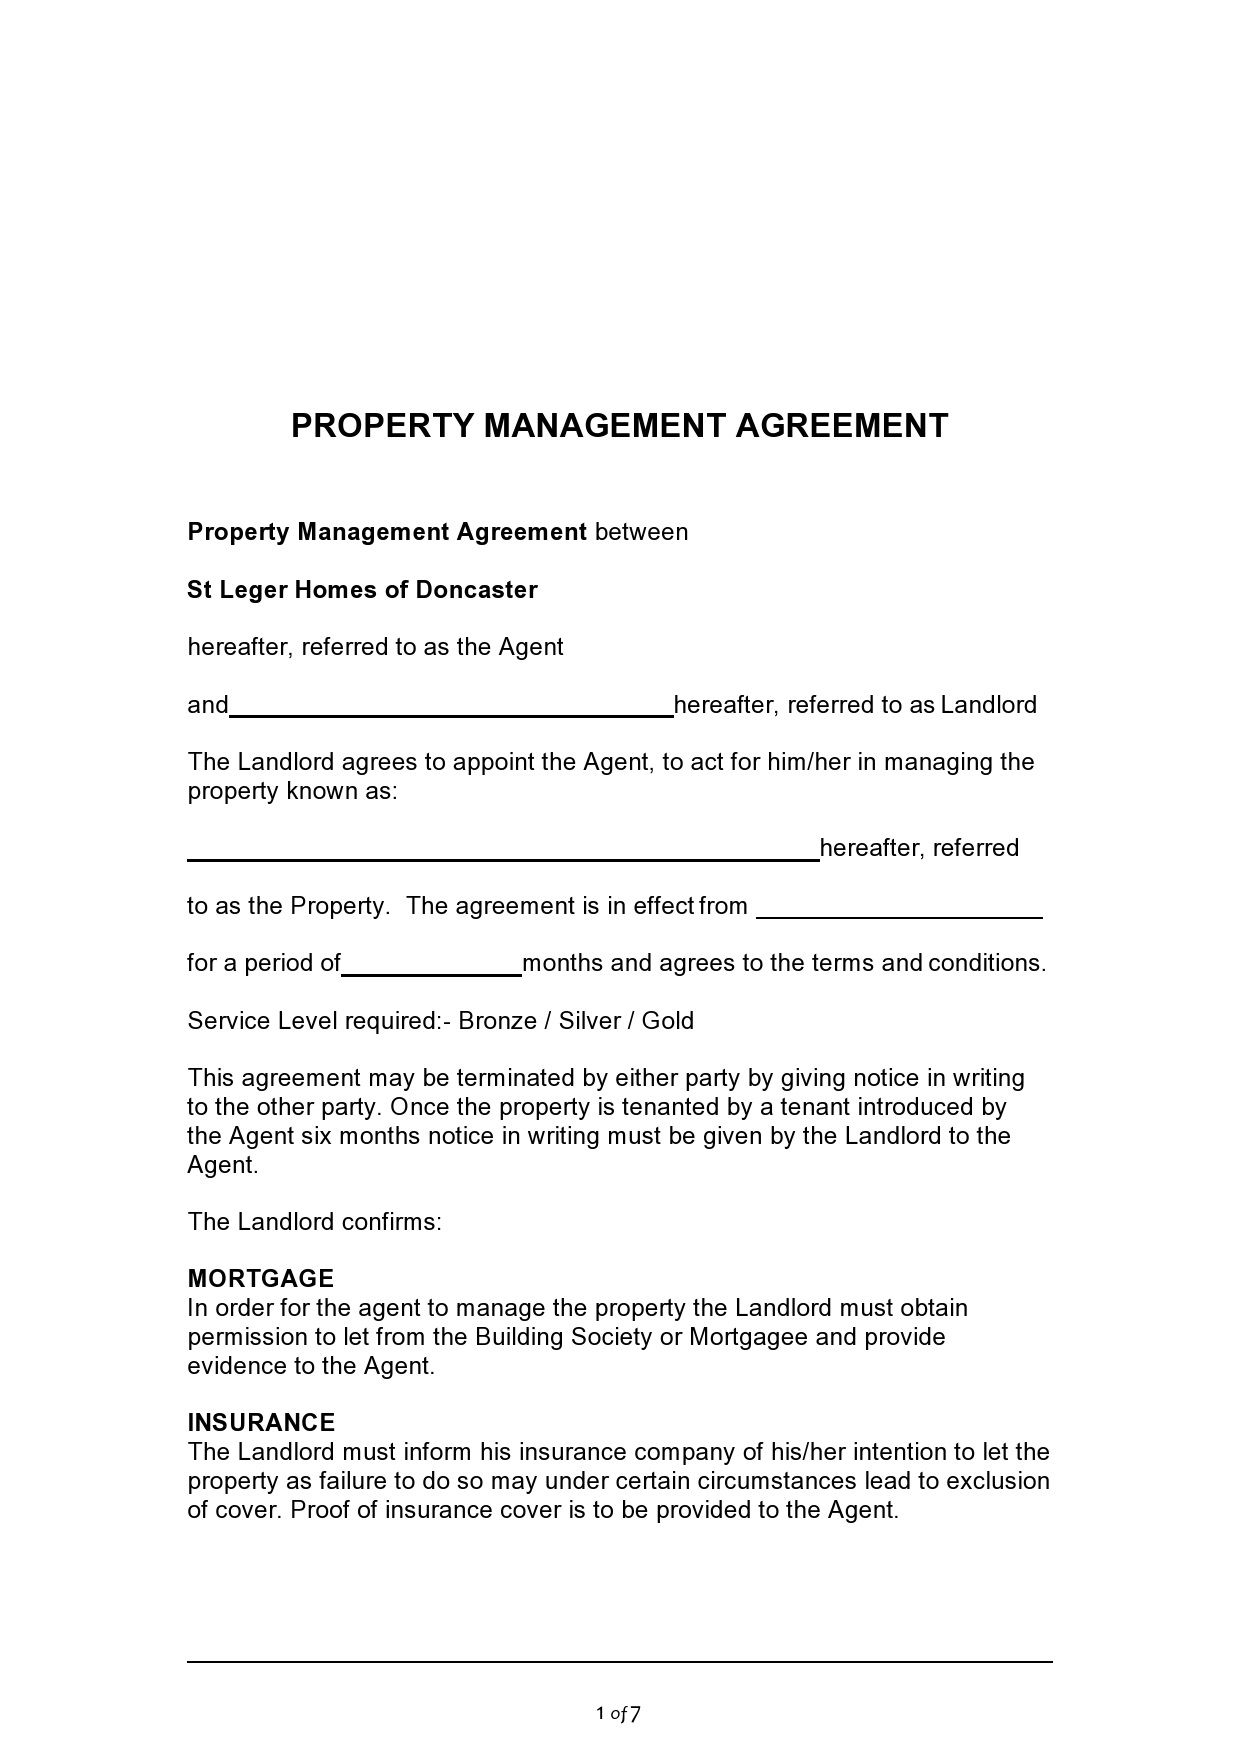 003 Impressive Commercial Property Management Agreement Template Uk Inspiration Full